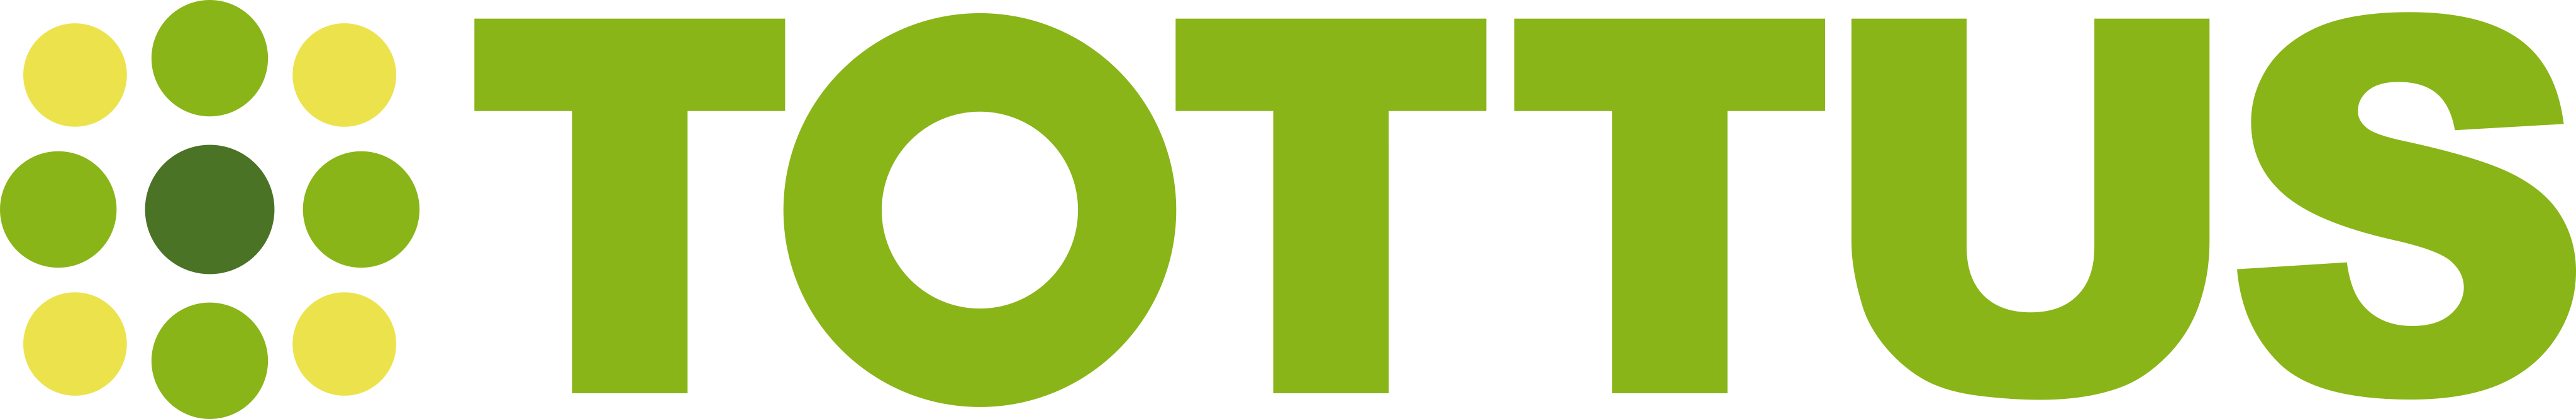 tottus-logo